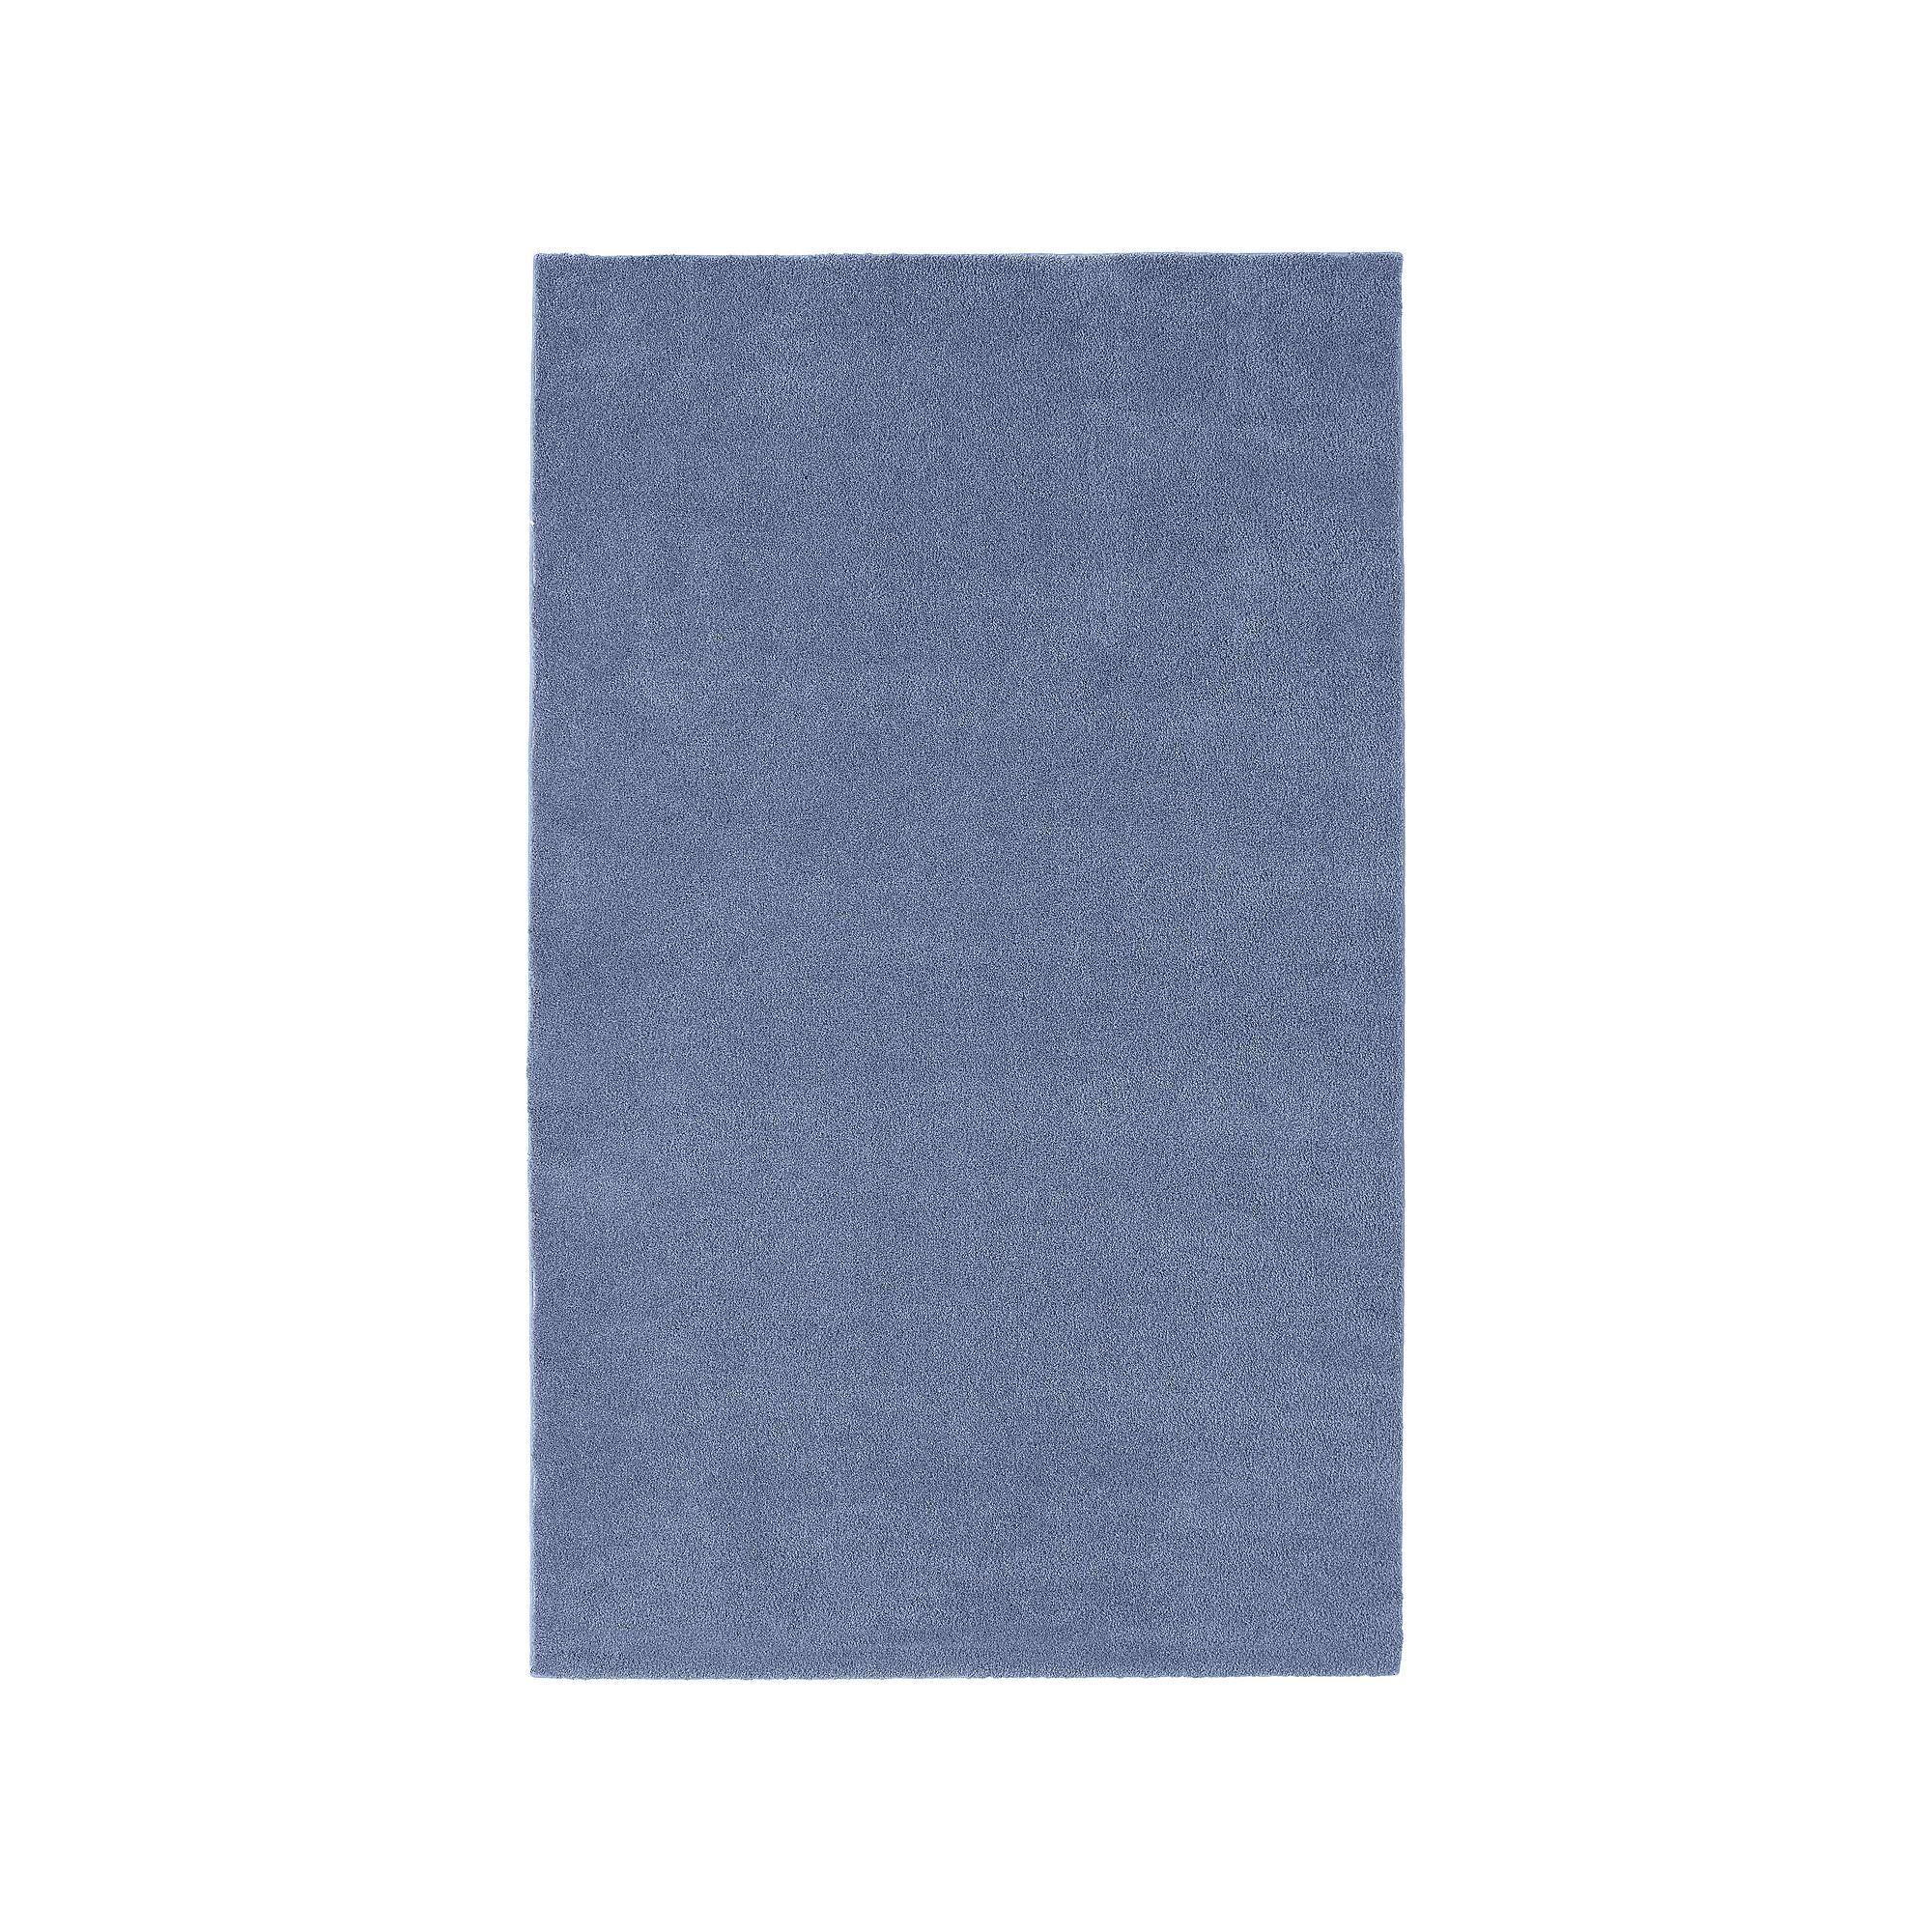 Fine Garland Rug Bathroom Carpet 5 X 8 Products Bathroom Download Free Architecture Designs Embacsunscenecom